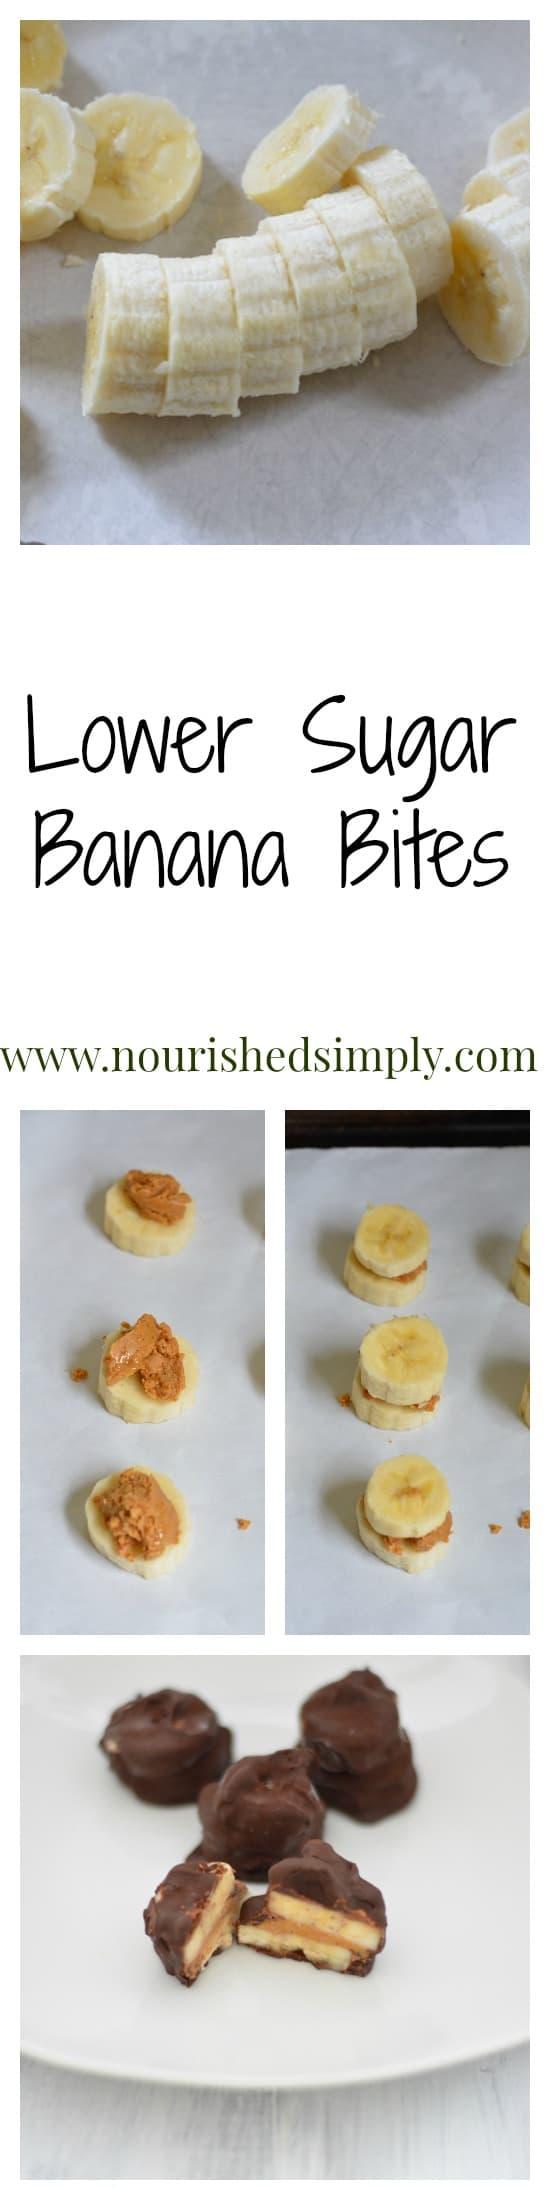 Banana Bites Collage